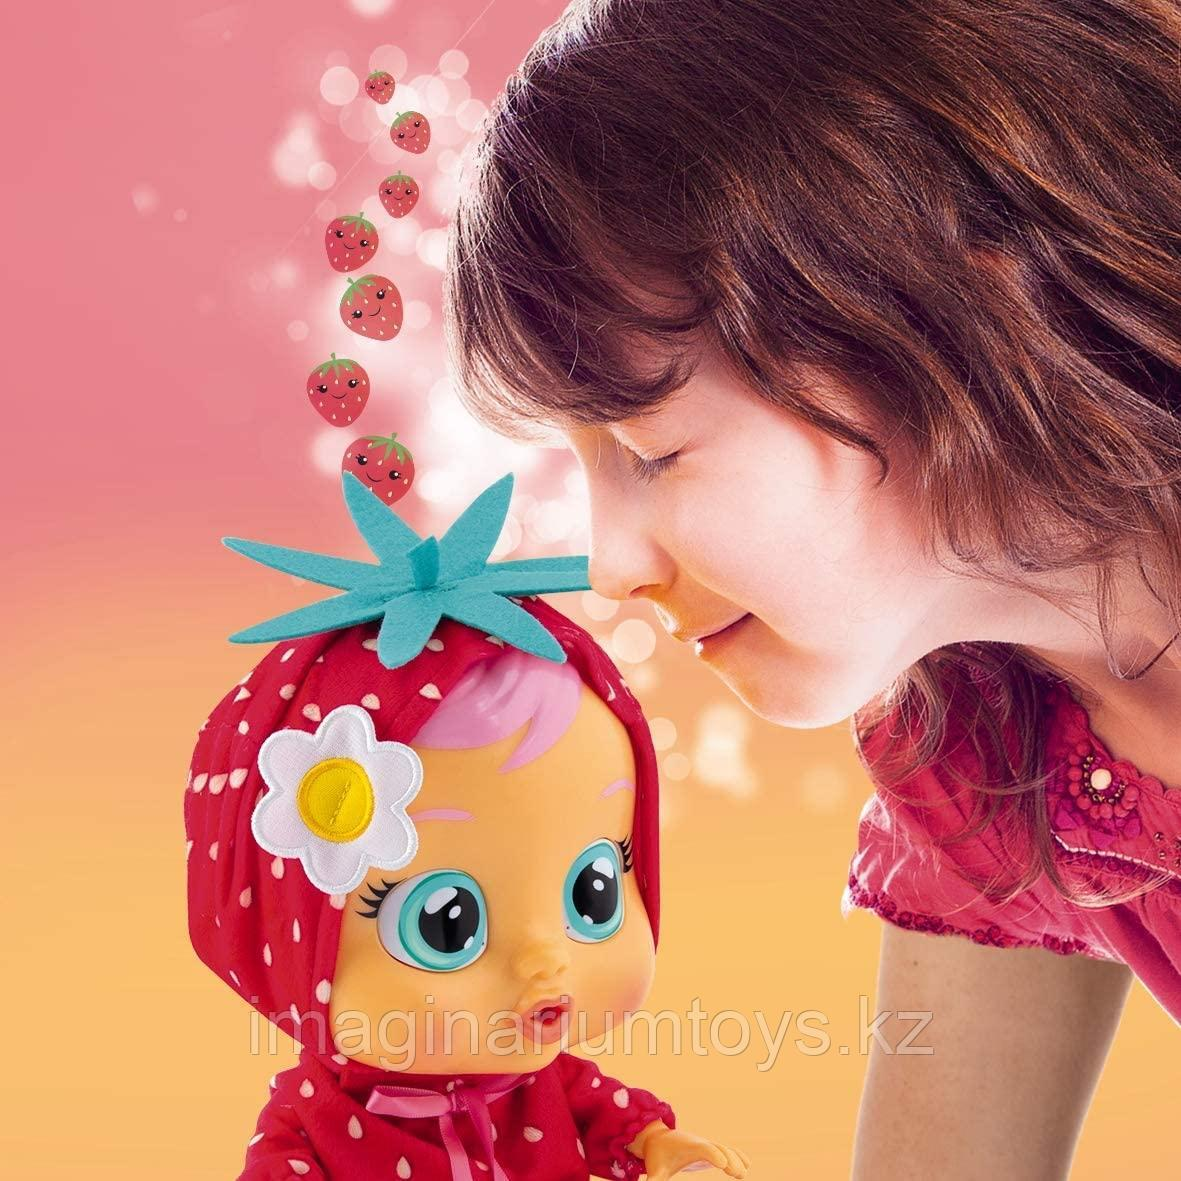 Кукла Cry Baby плачущая Элла с запахом клубники - фото 4